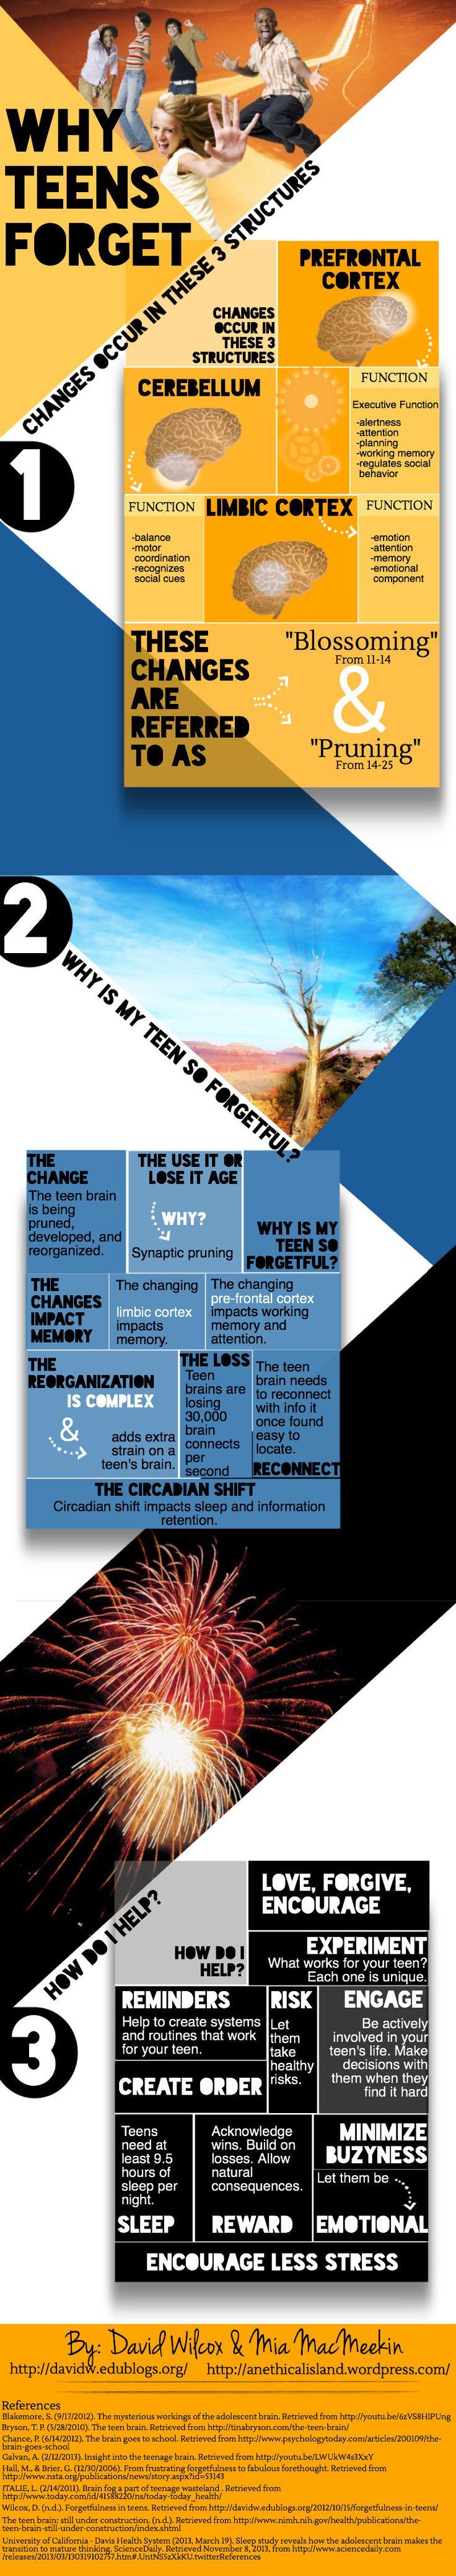 Why is my teen so forgetful?   An inforgraphic from Mia Macmeekin http://anethicalisland.wordpress.com